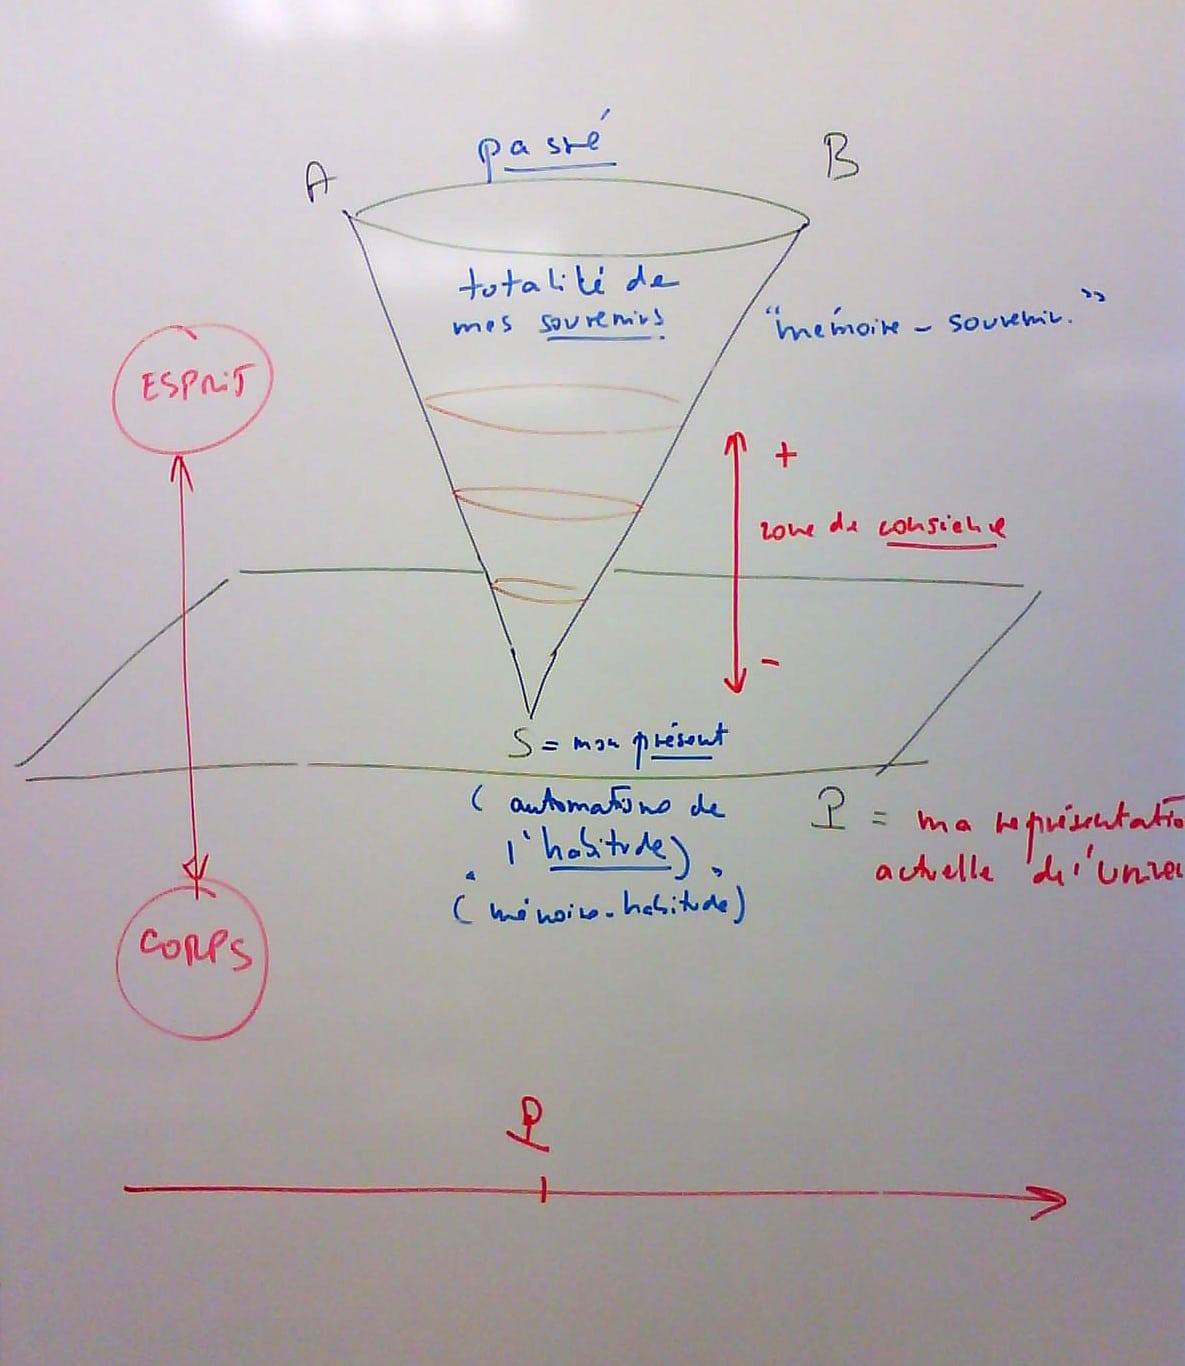 Cone de Bergson